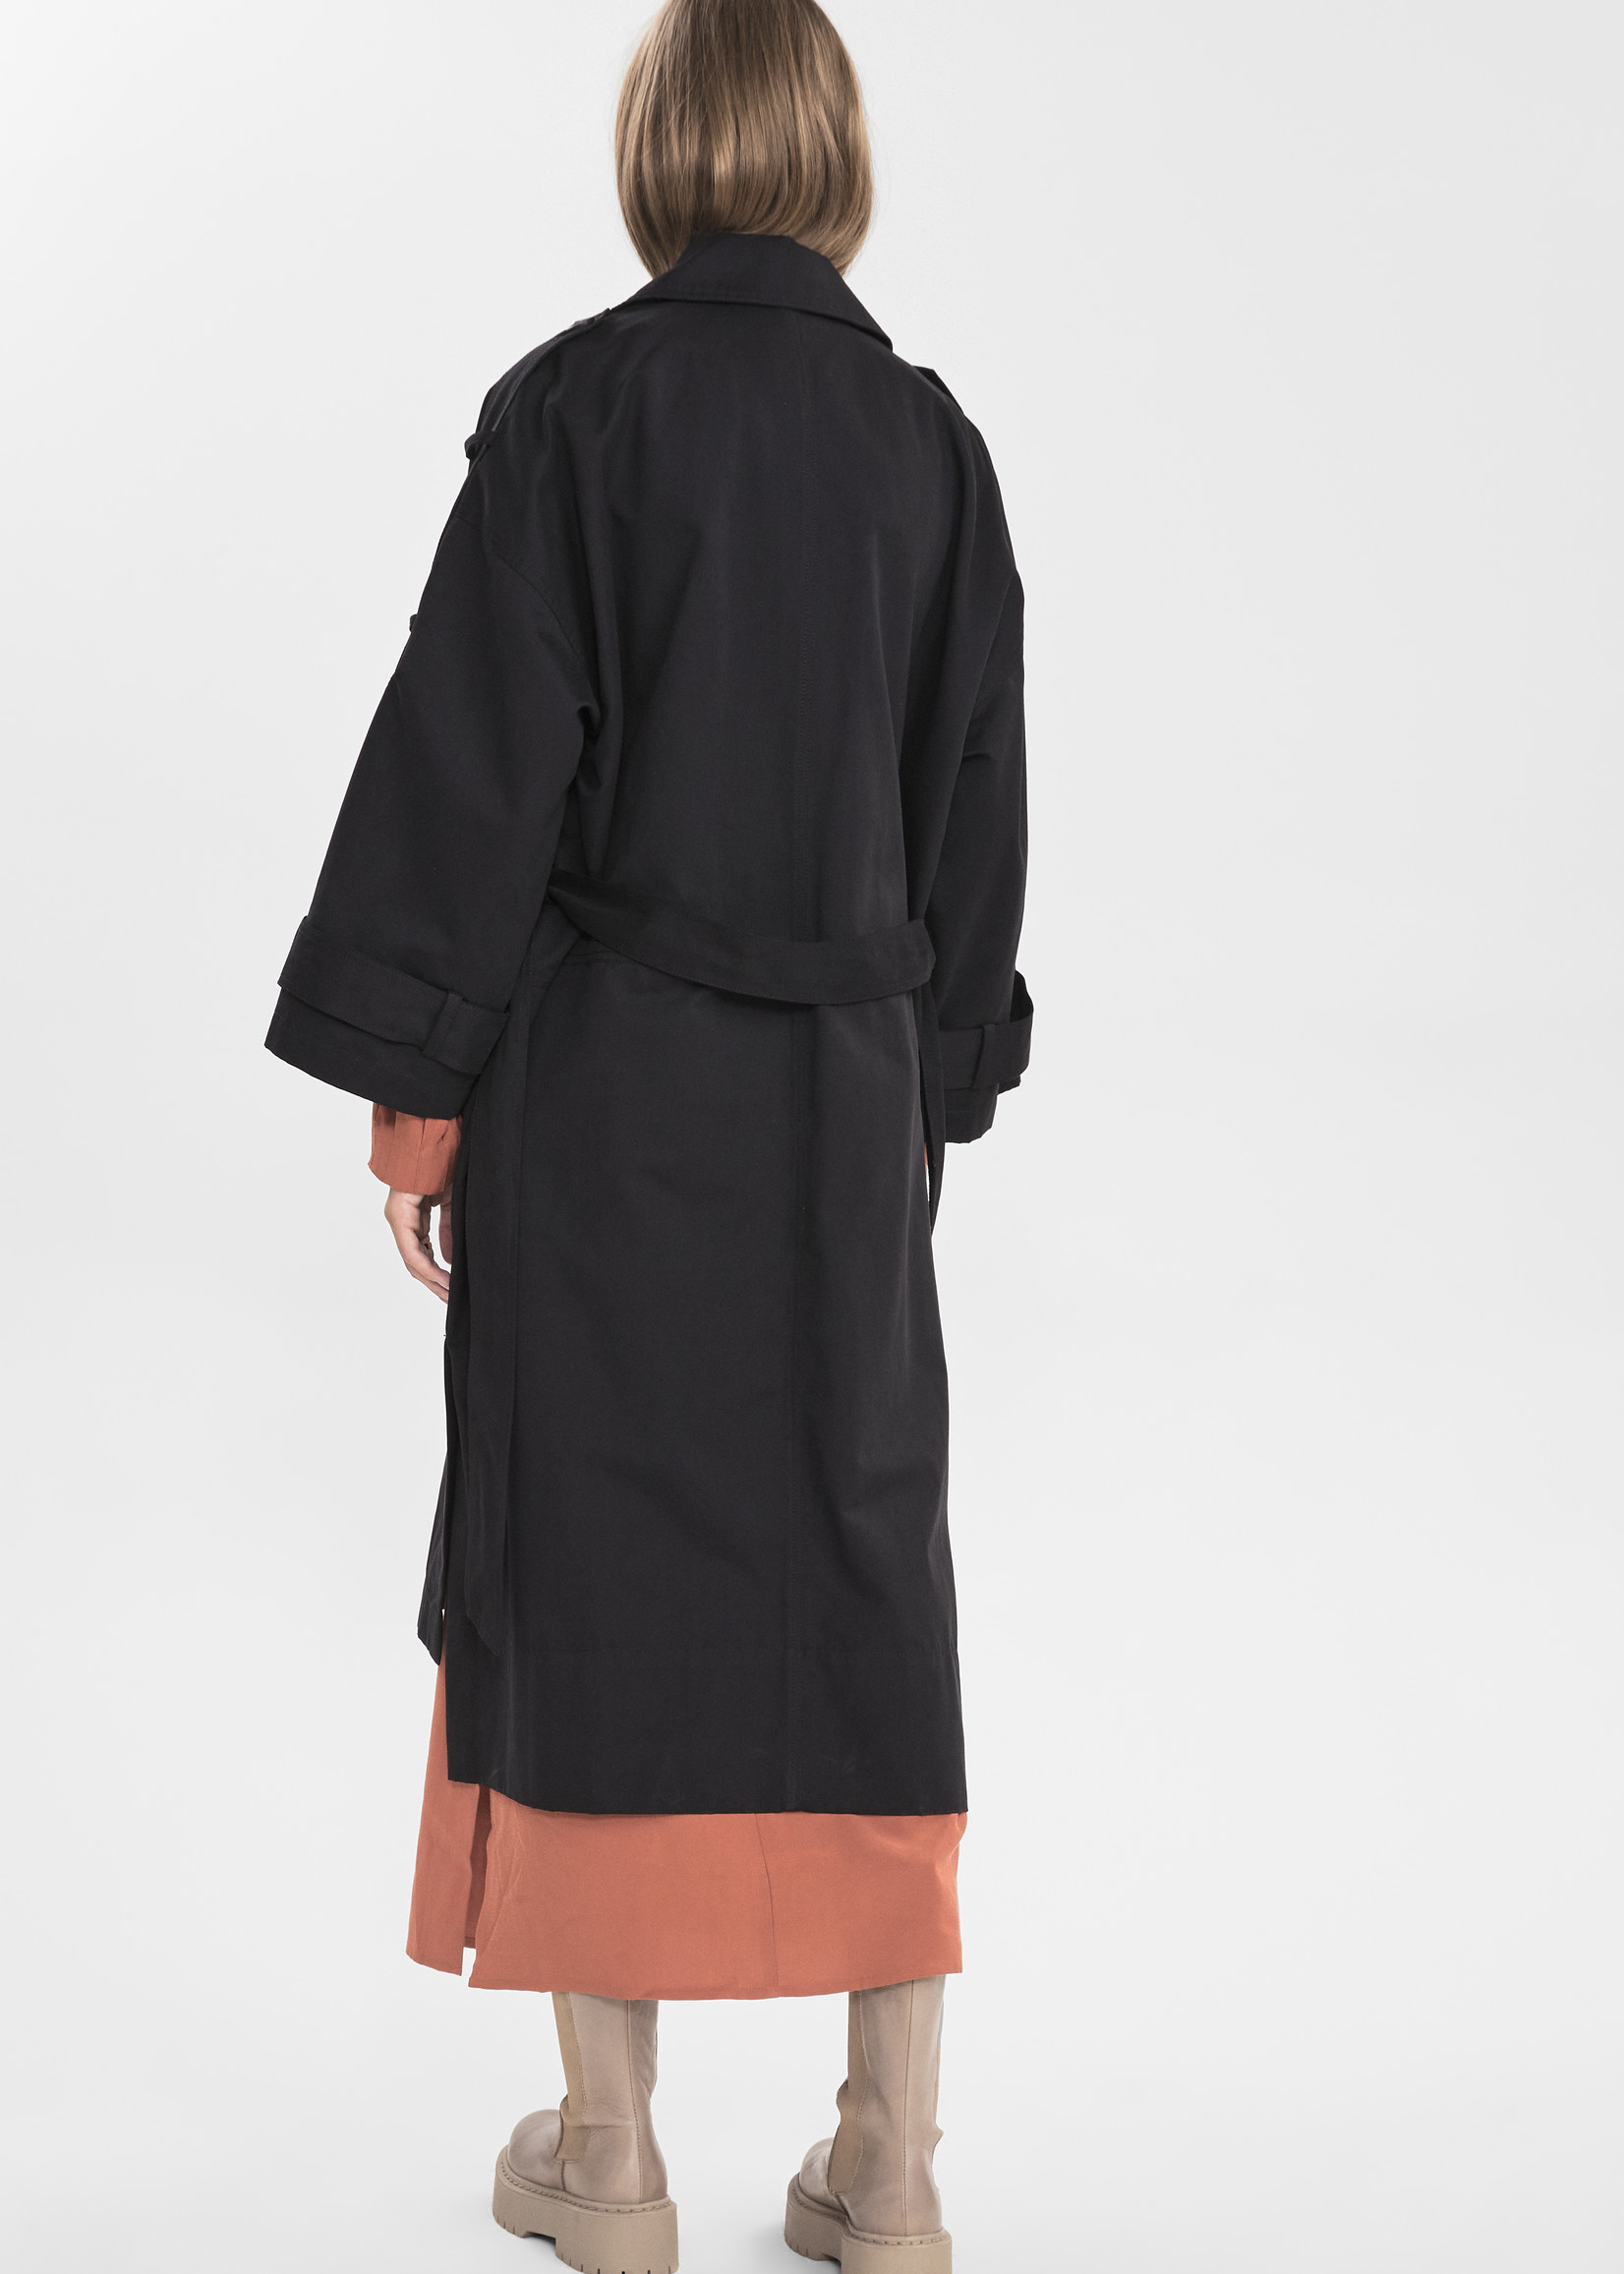 Numph Sisilla Jacket